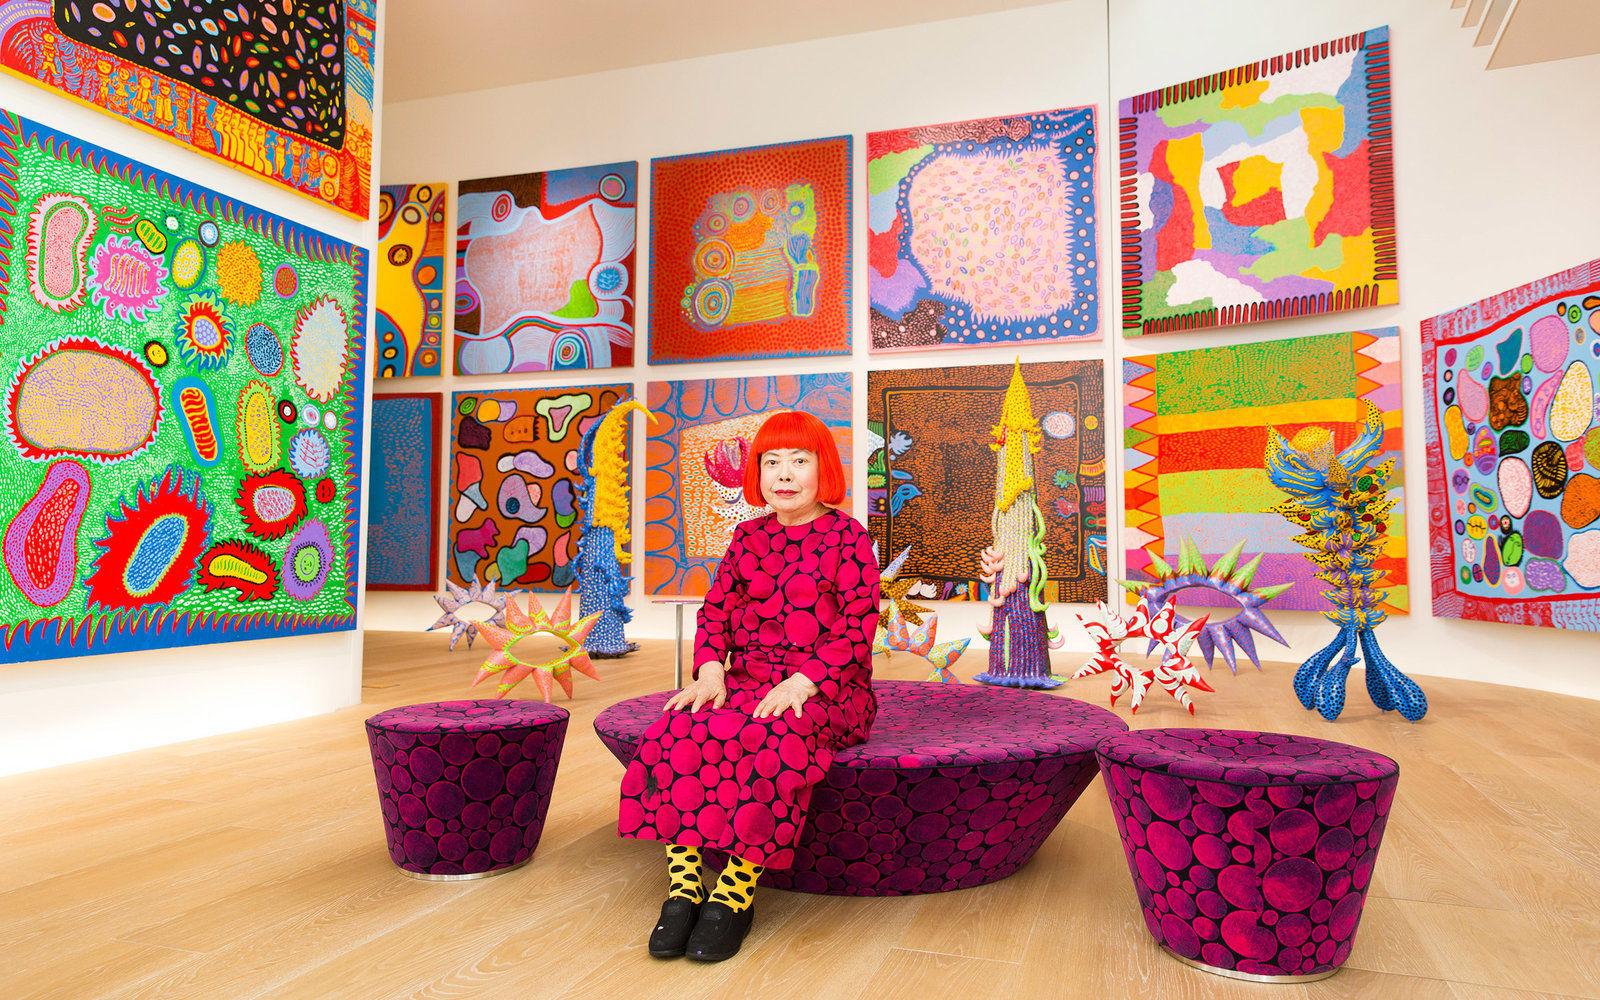 Tickets for Yayoi Kusama's art exhibition in Tokyo